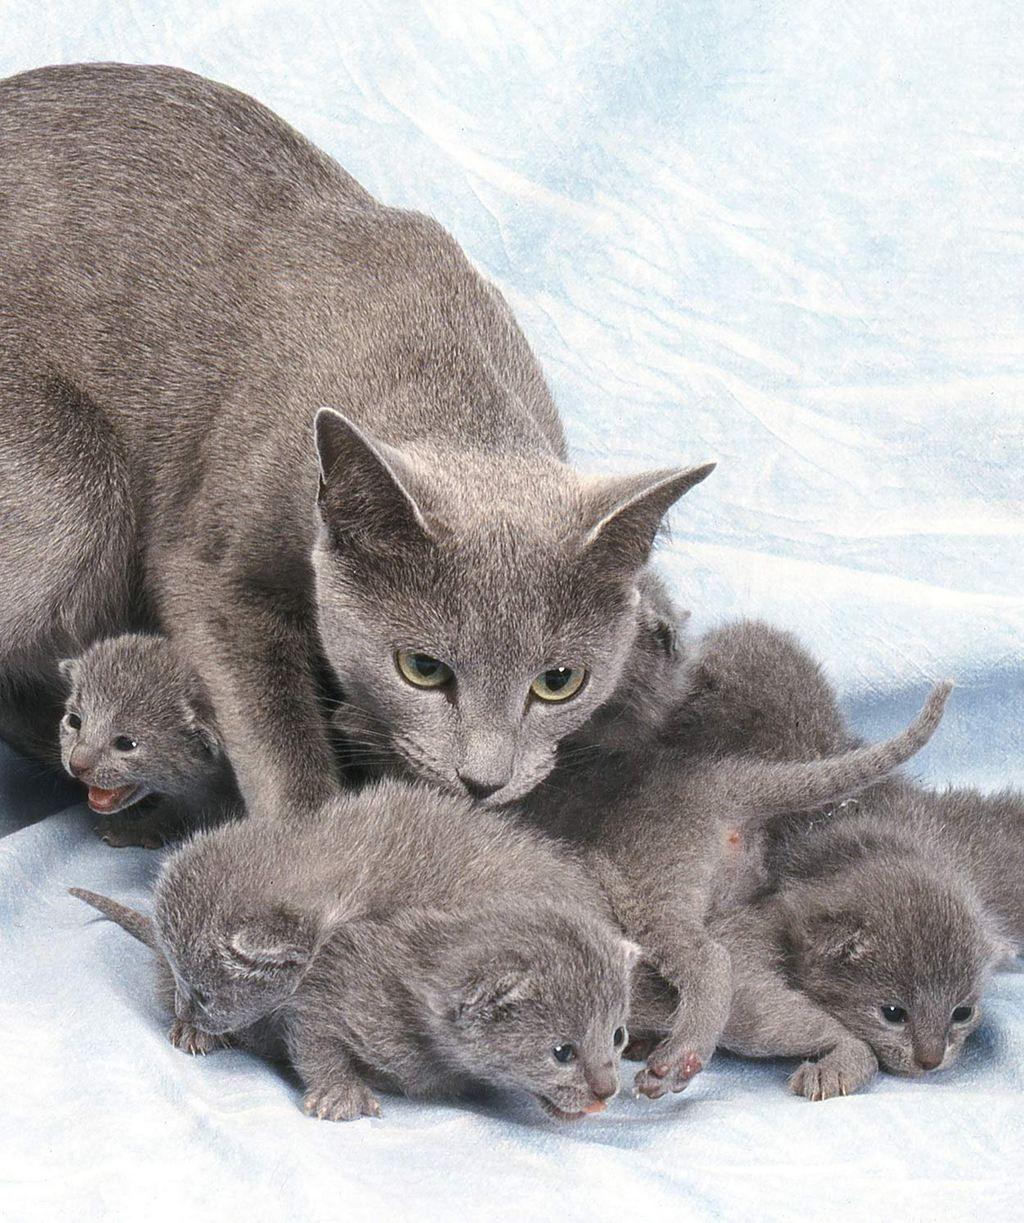 Cat products at Banggood USA. cats kittens kitten Meow